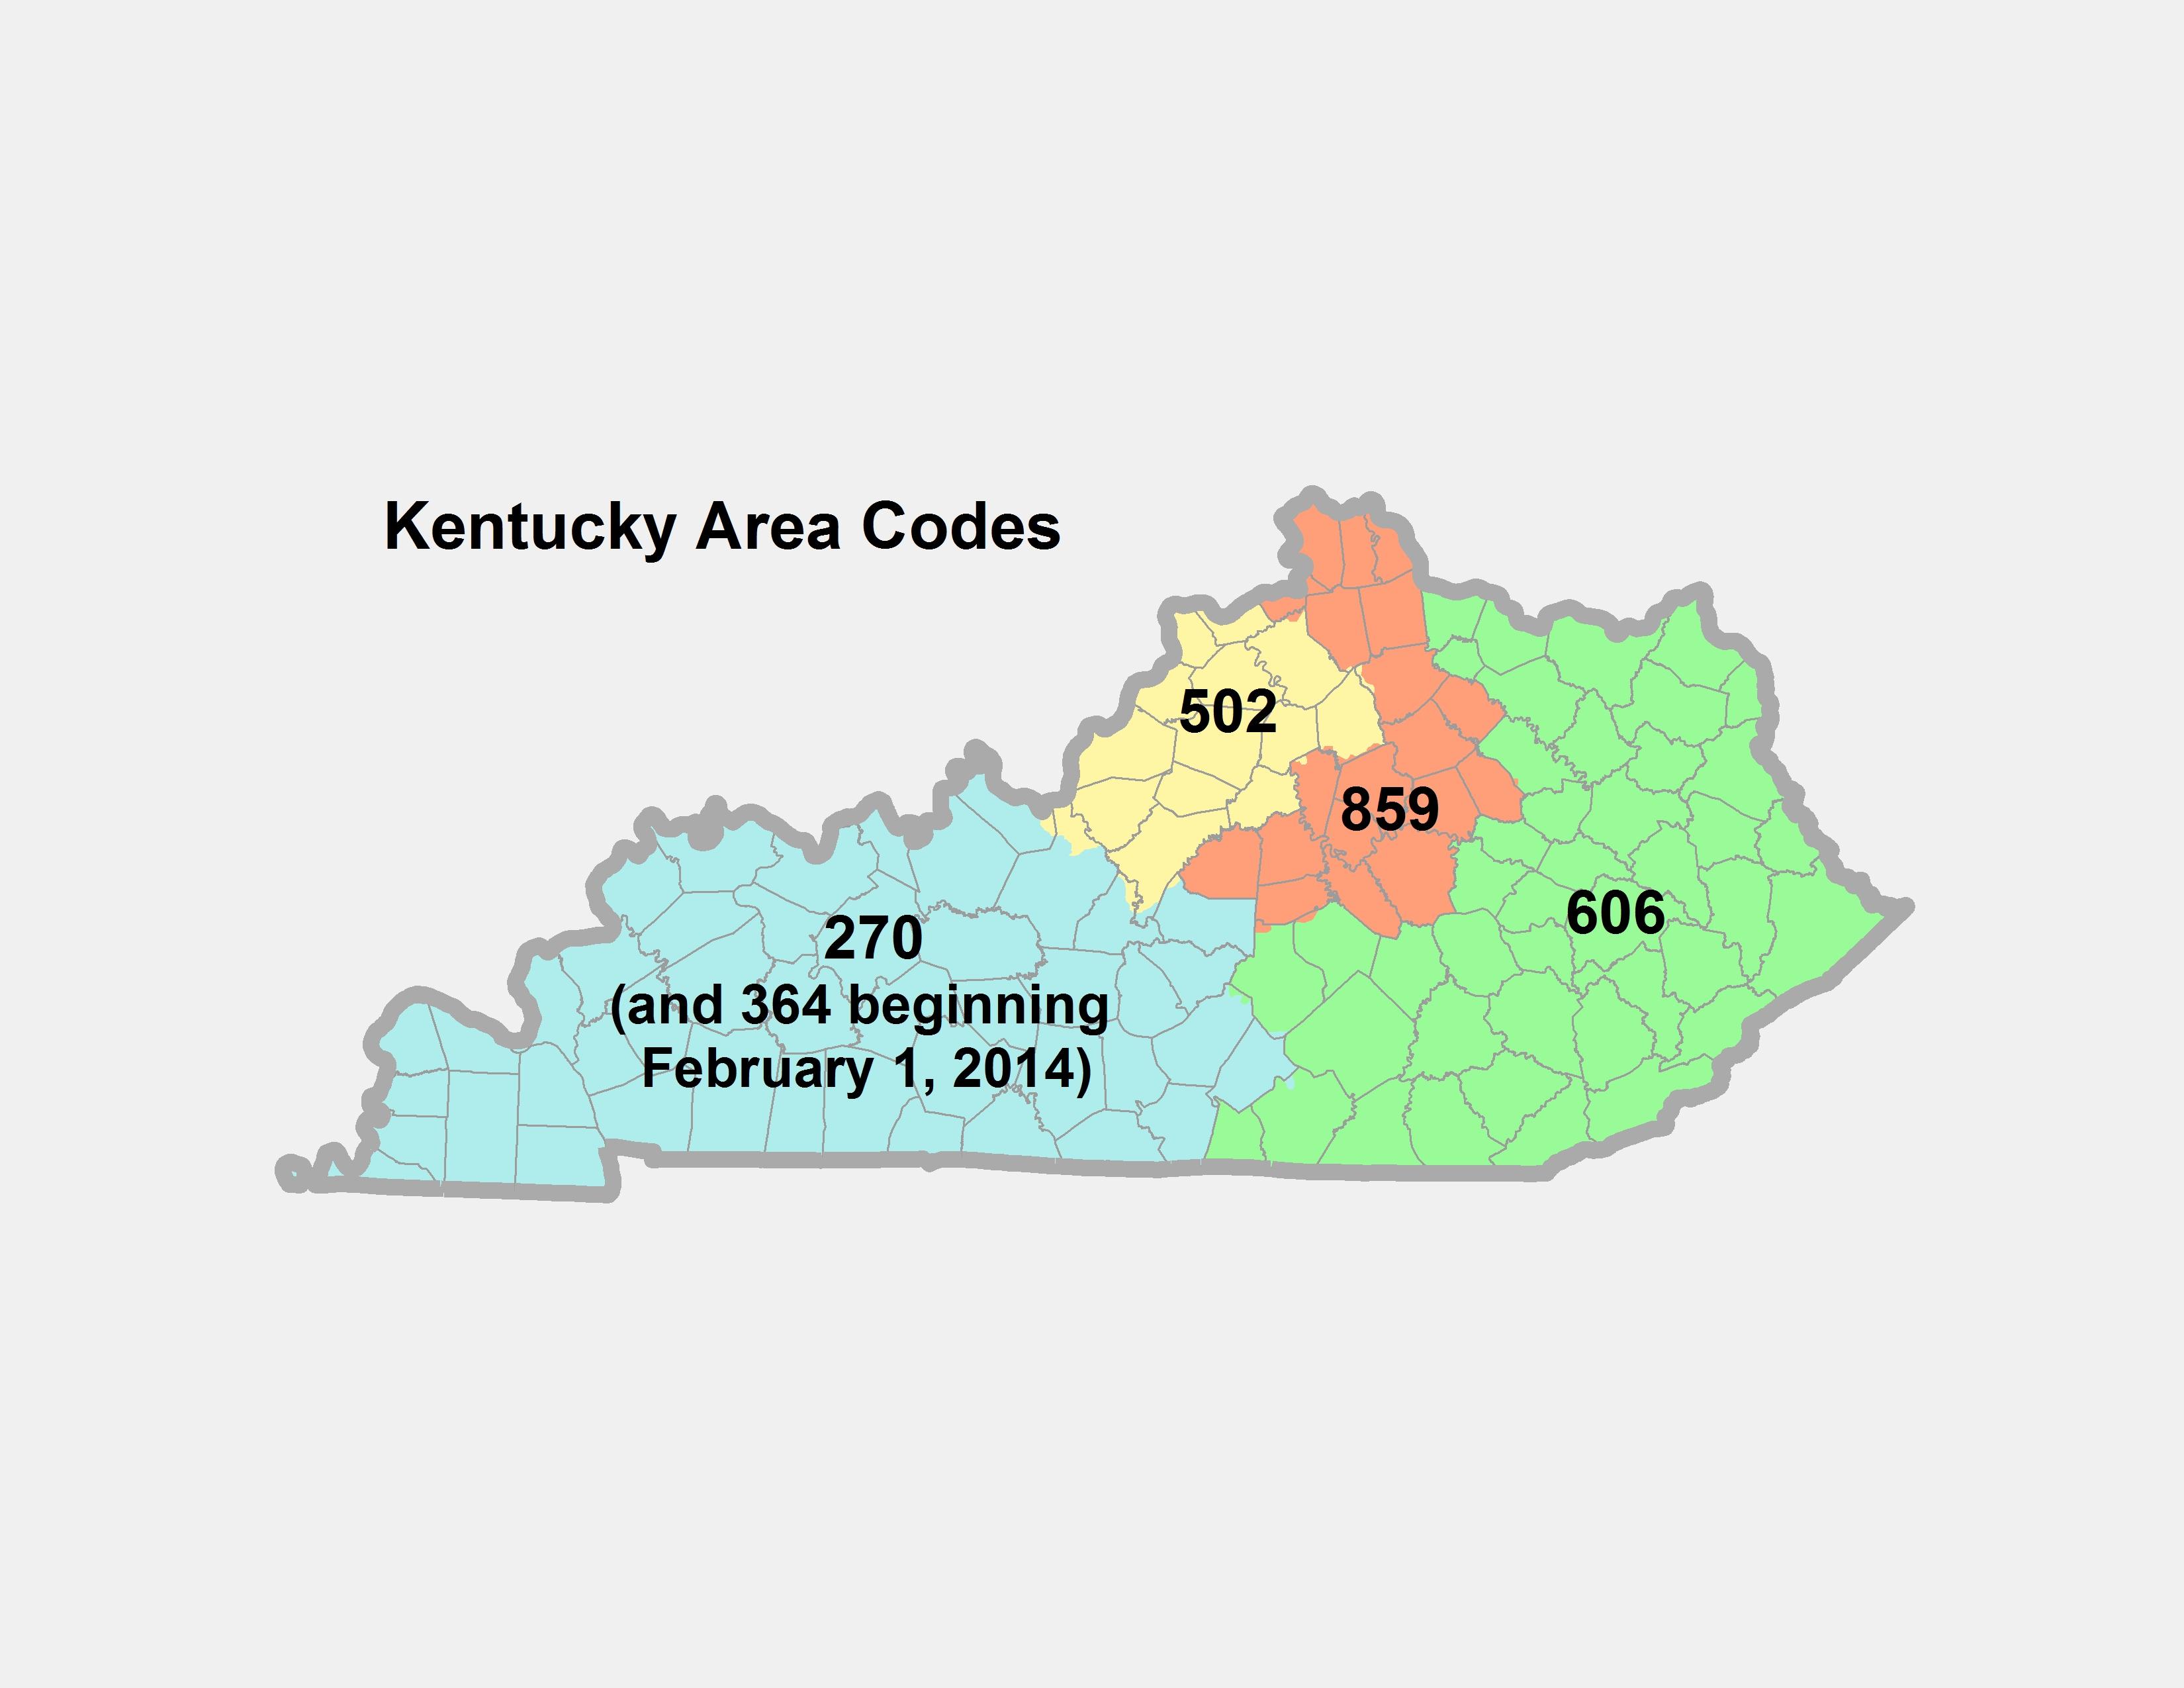 KY Public Service Commission - 859 area code